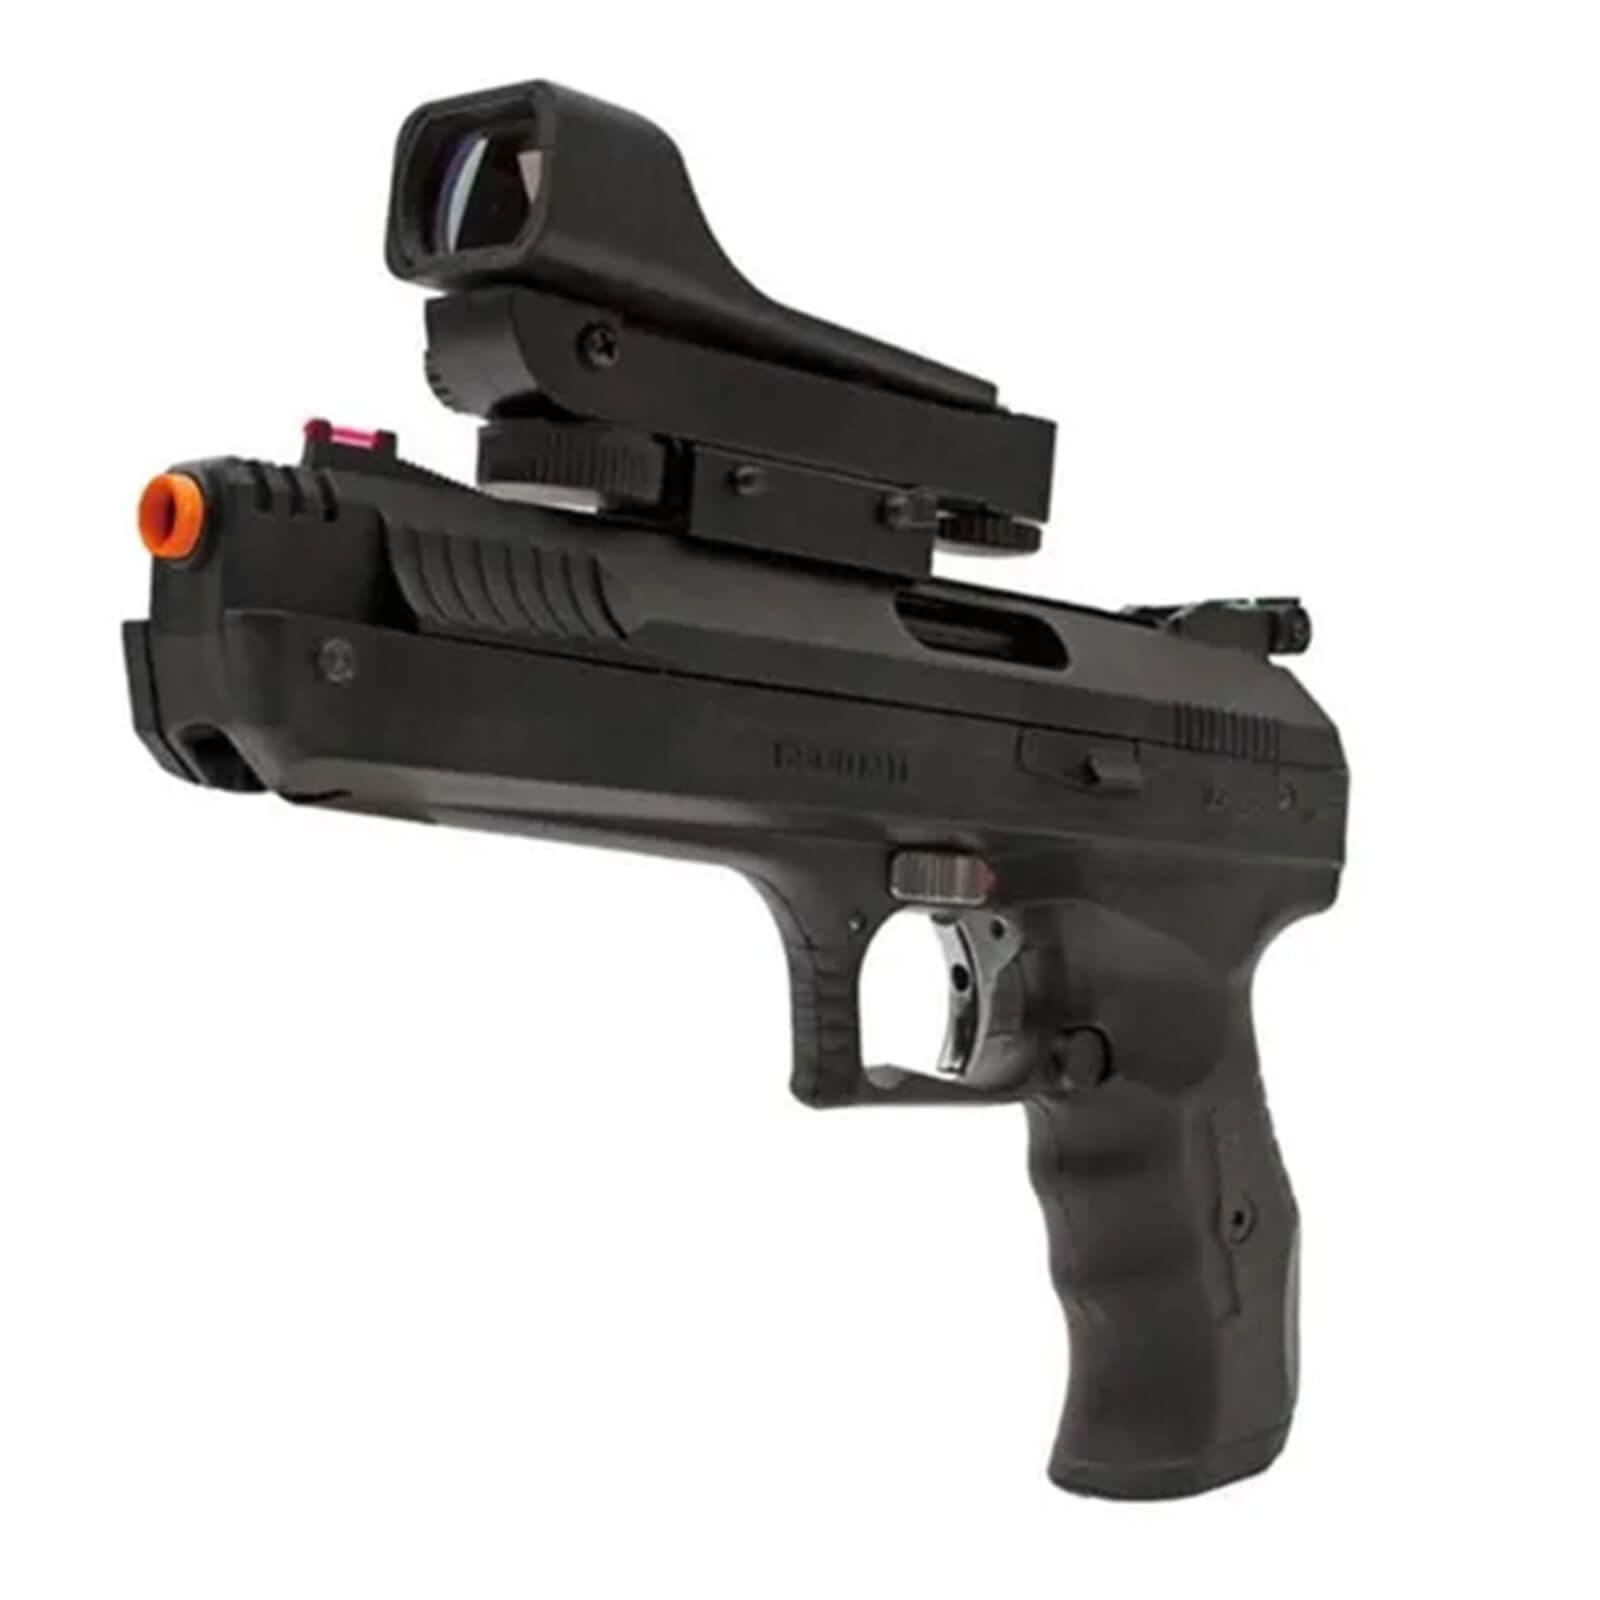 Pistola De Pressão Beeman 2006 Com Red Dot 4,5mm + Bag Rossi Brinde